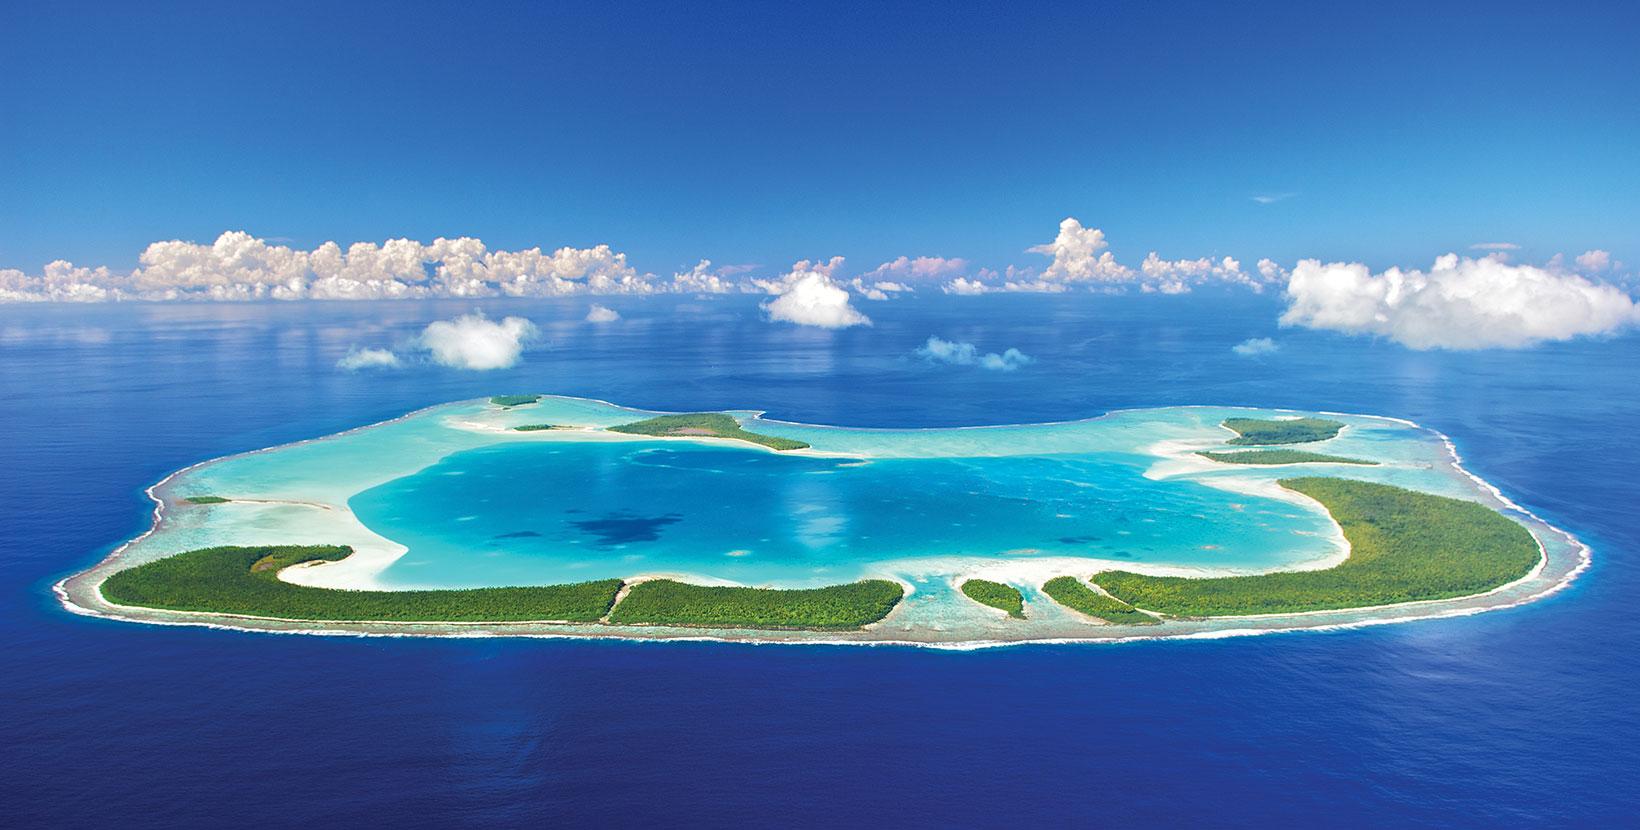 L'atoll de Tetiaroa à 53 km au Nord de Tahiti, acquis en 1966 par l'acteur Marlon Brando ©The Brando